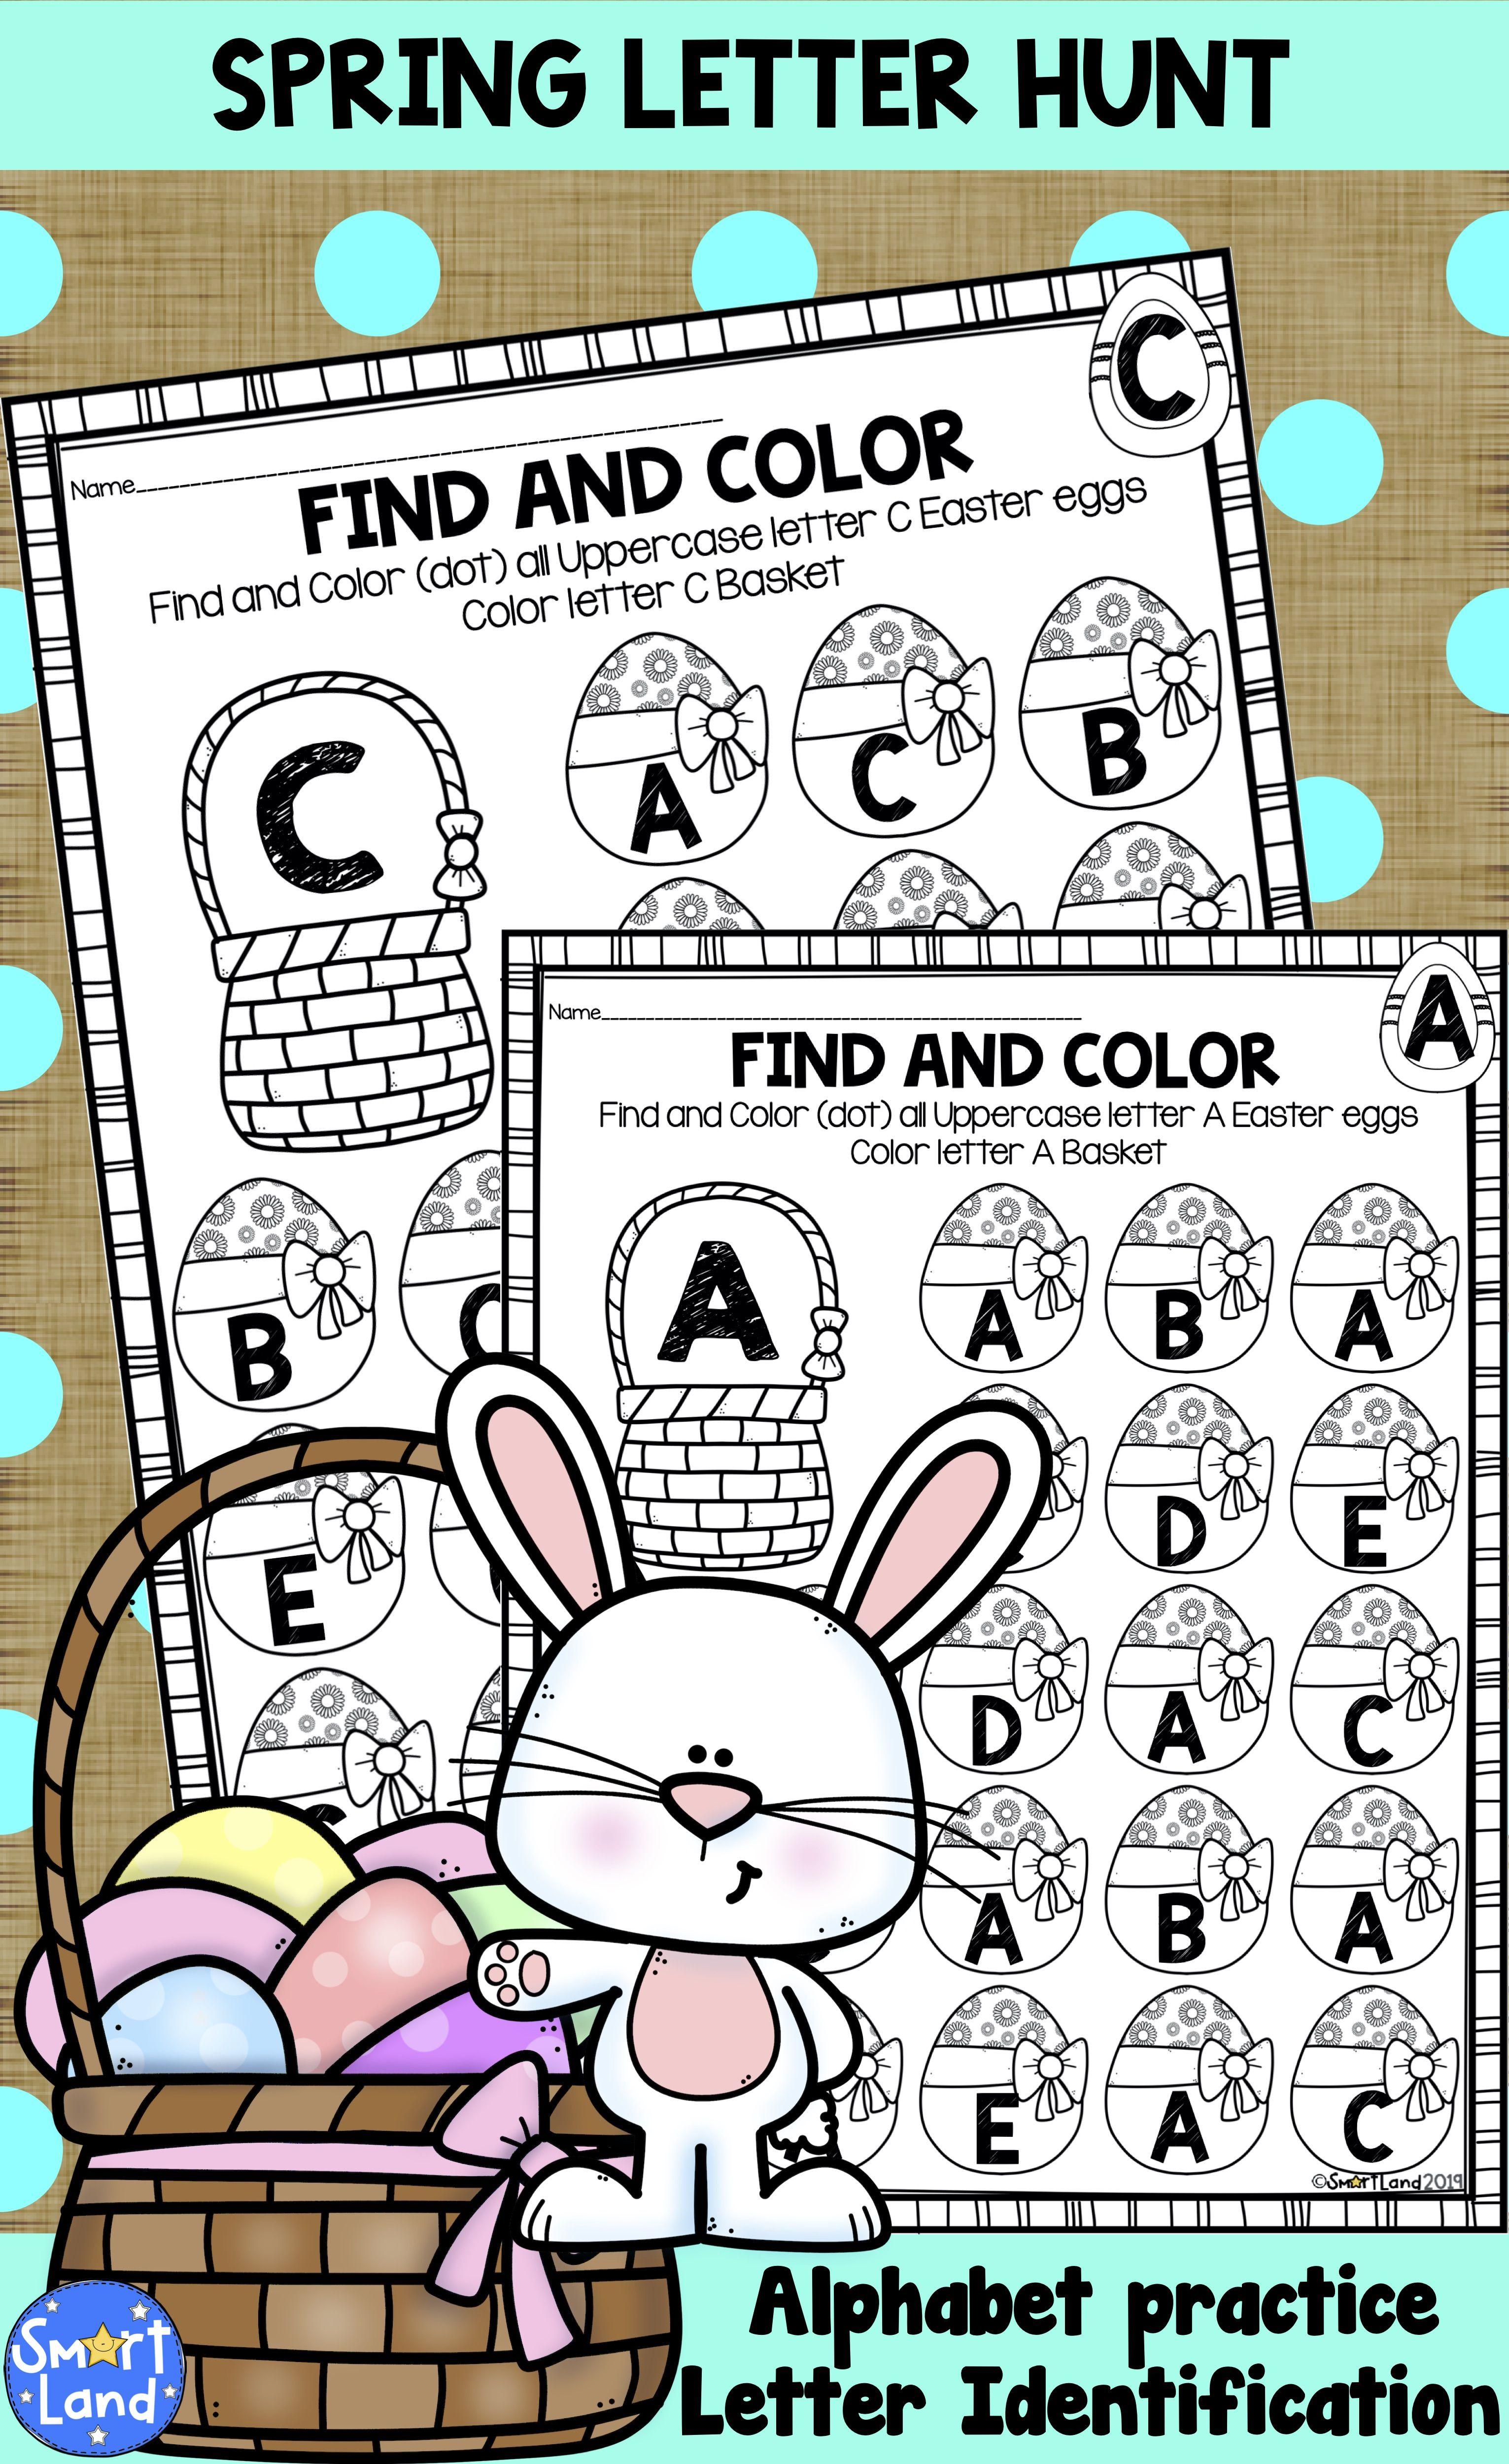 Alphabet Practice Letter Search Eastereggs